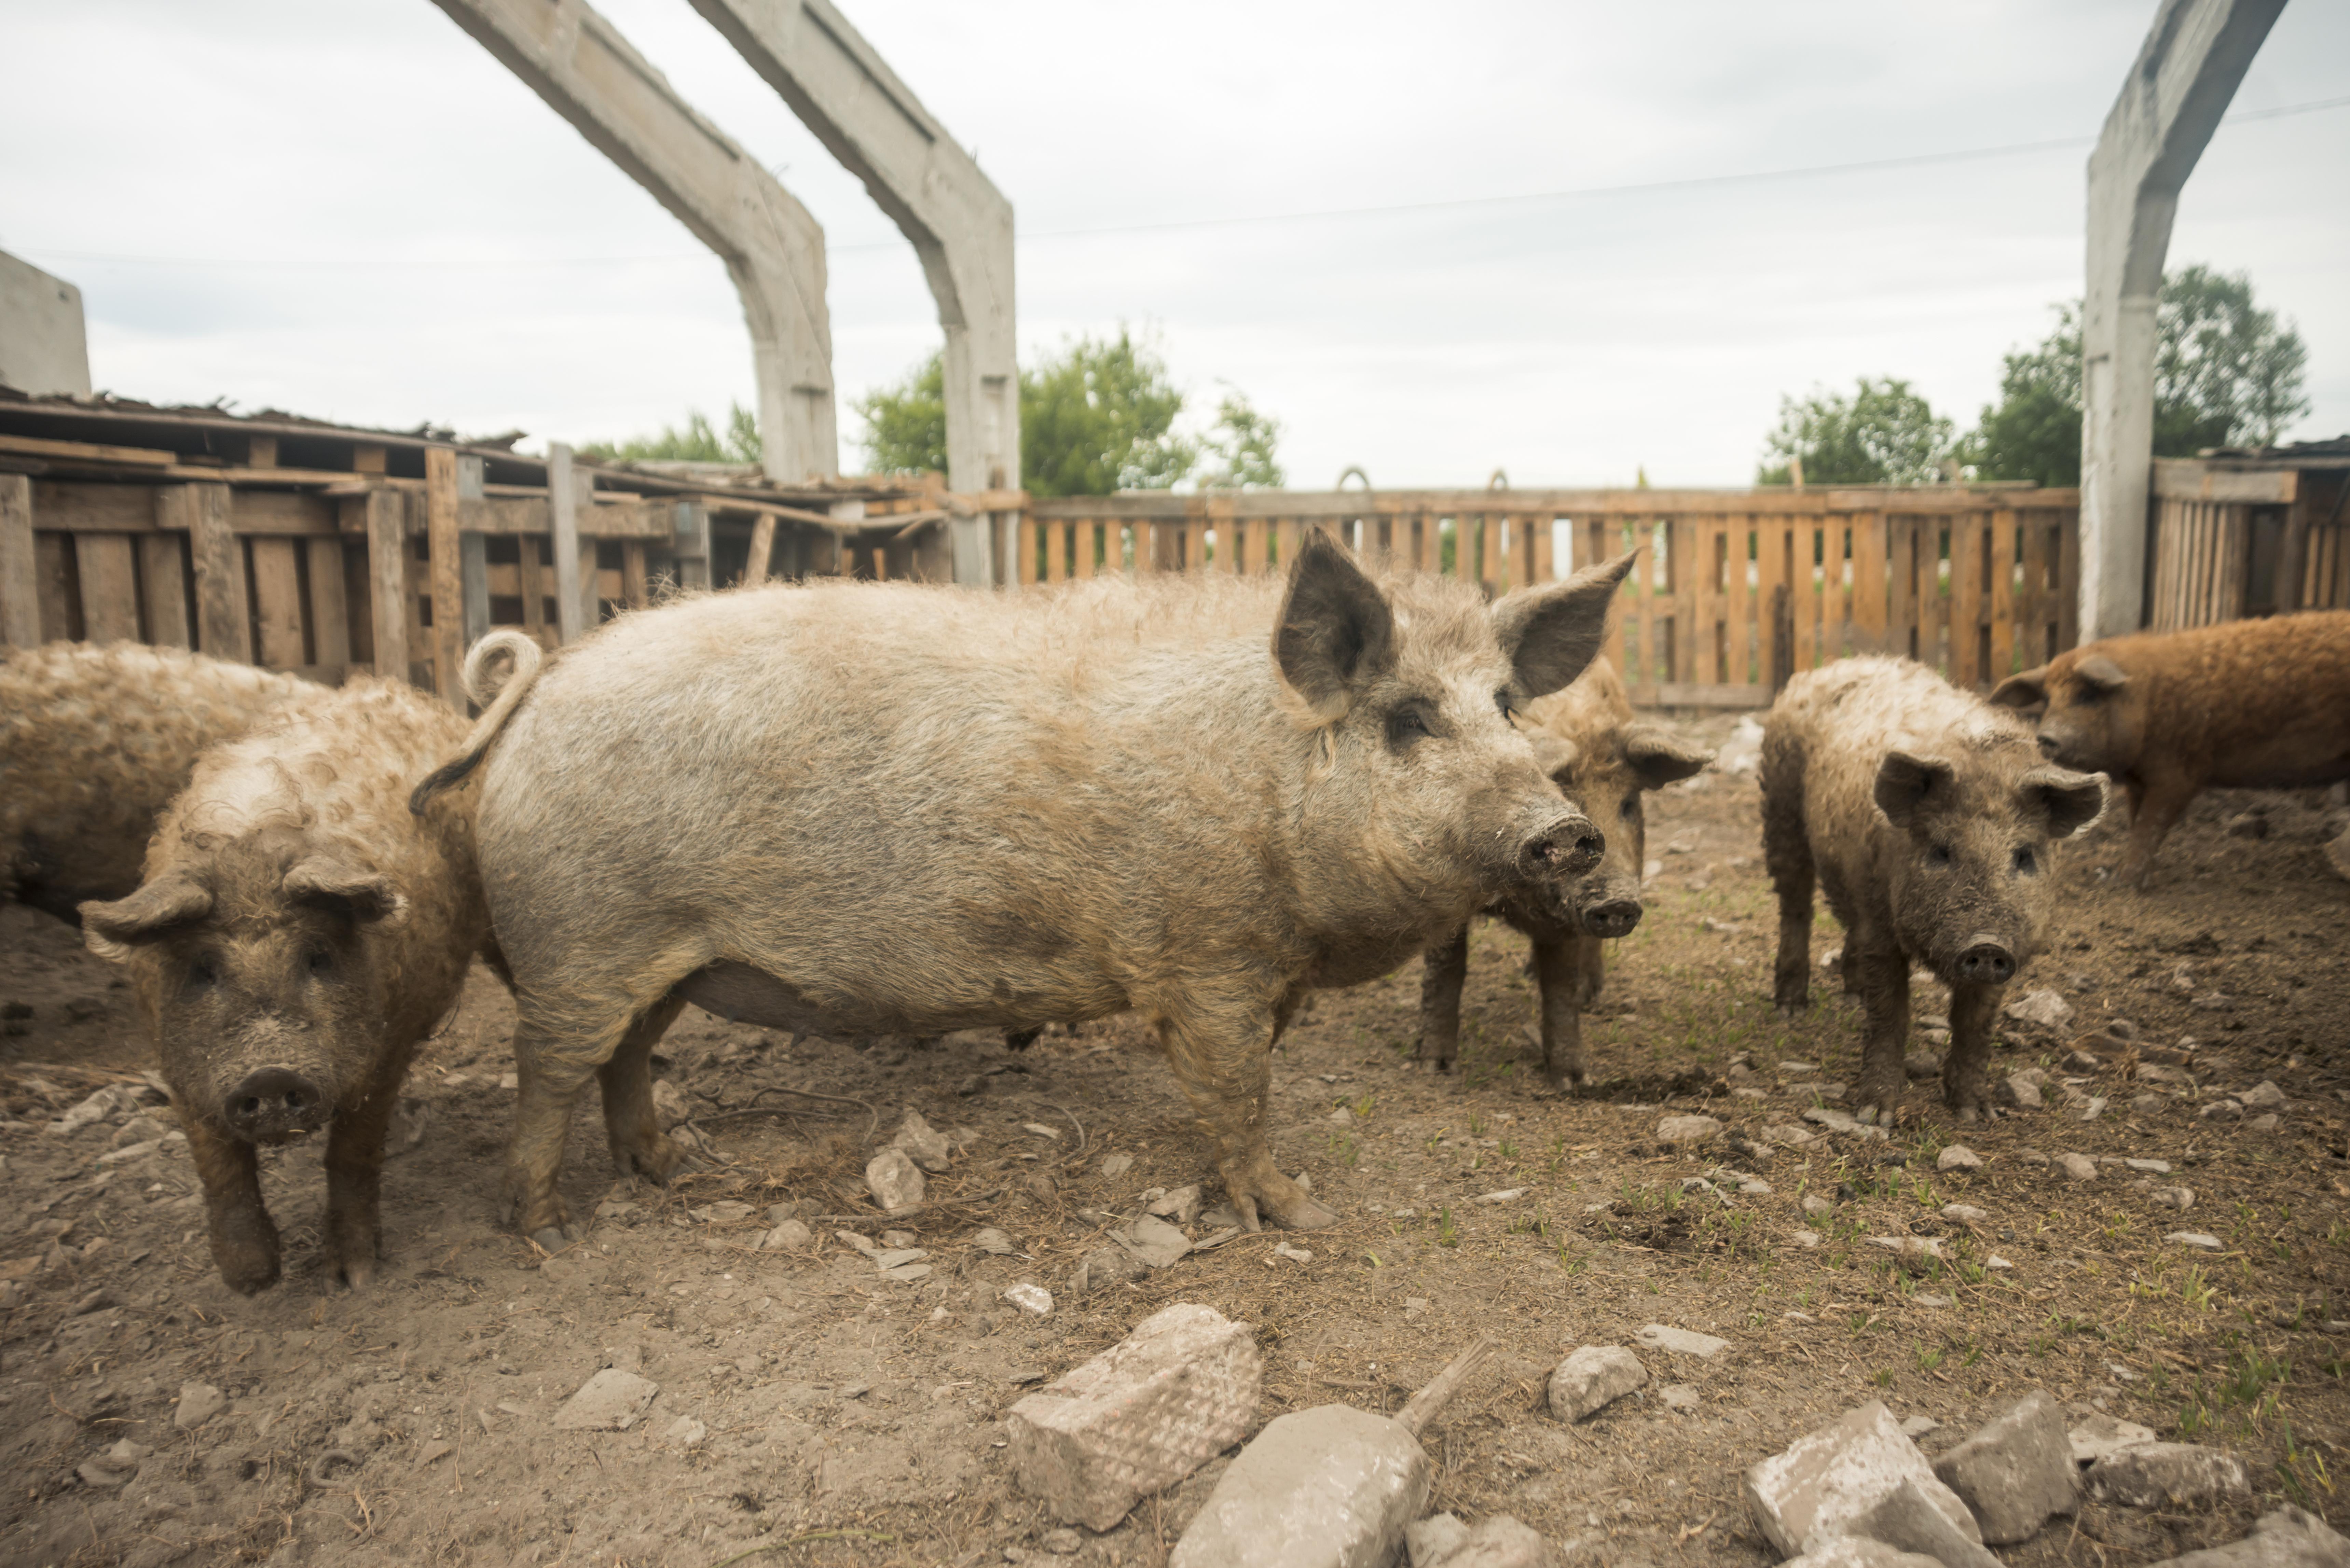 Producción de cerdo crece en España